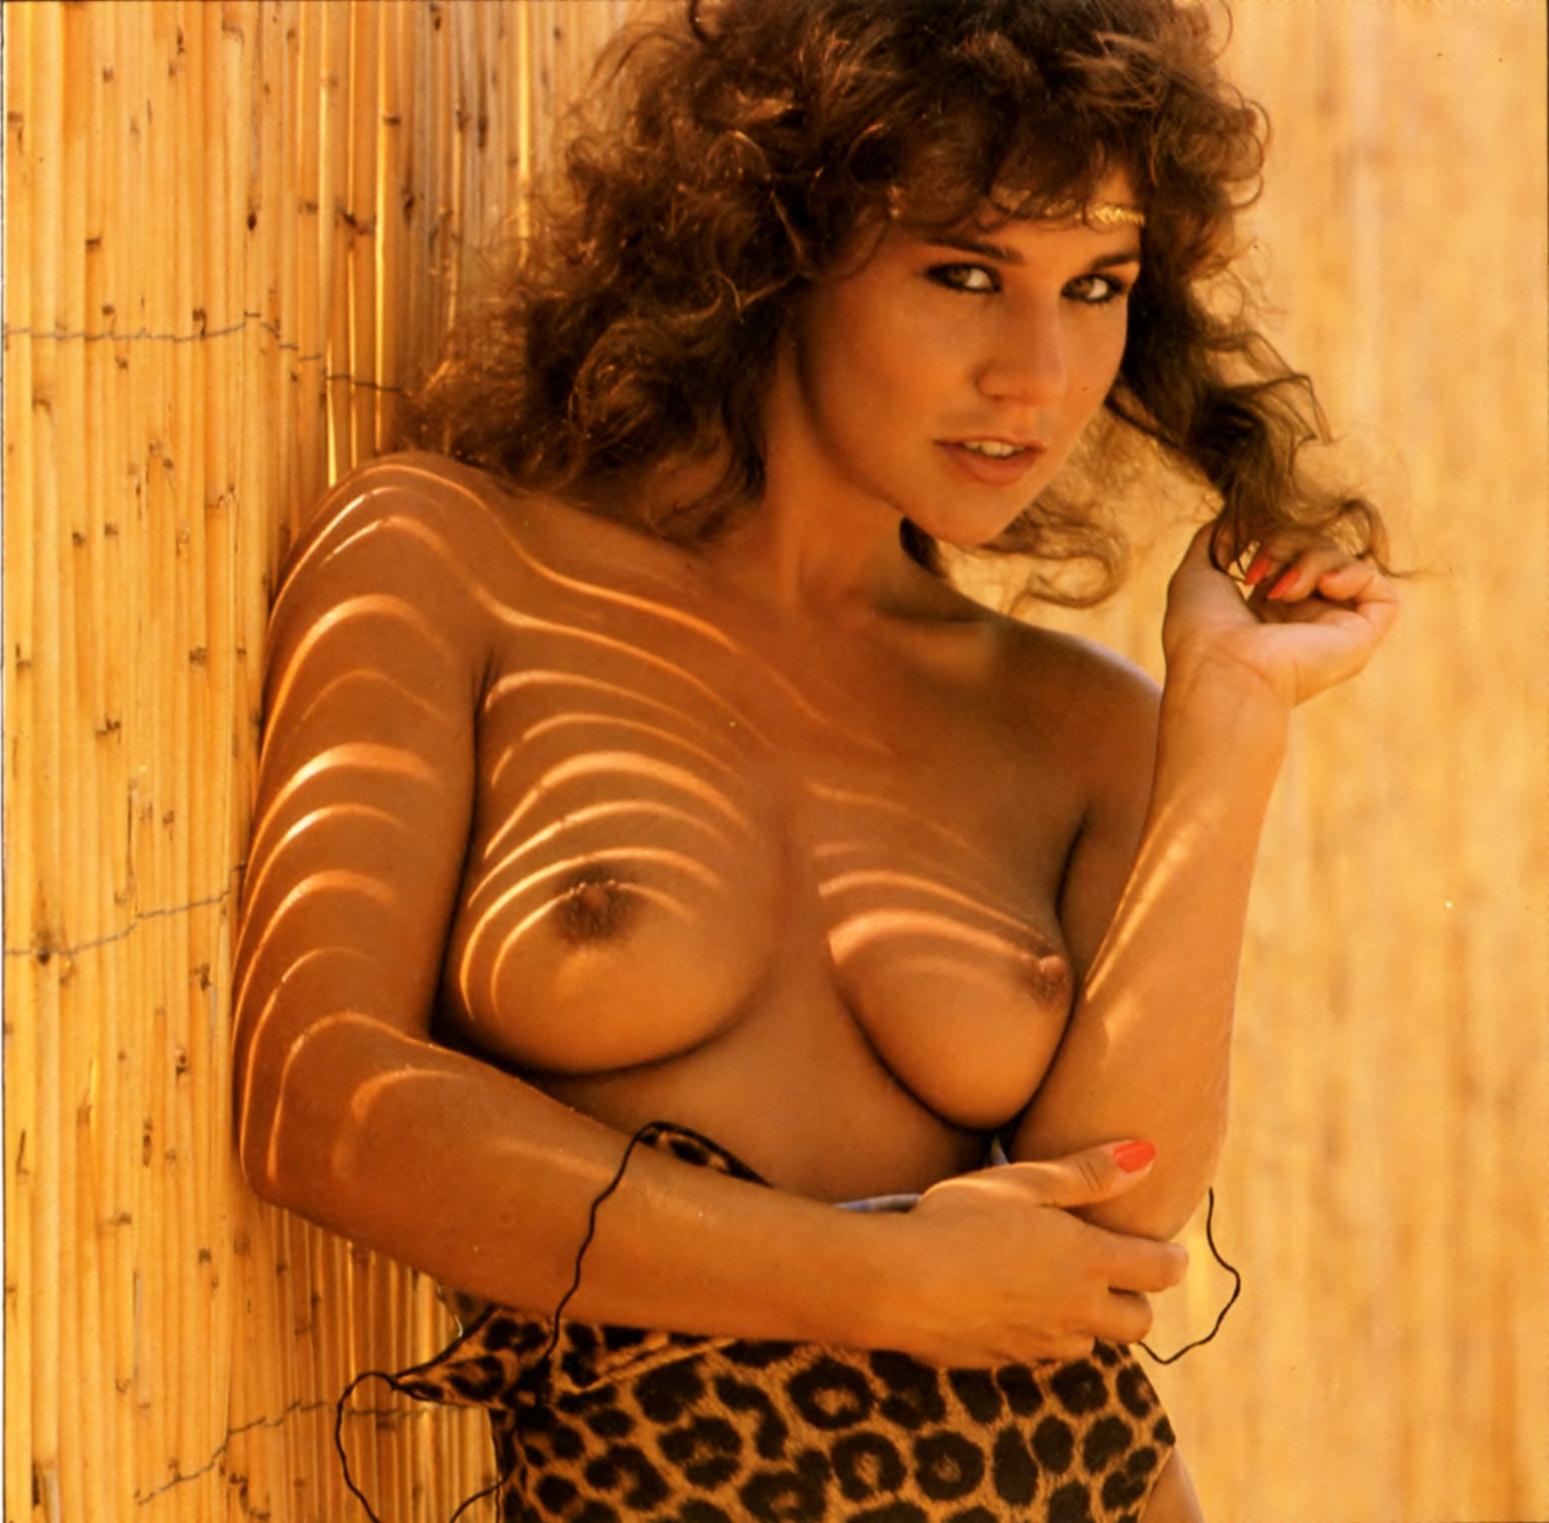 Linda bollea nude photos